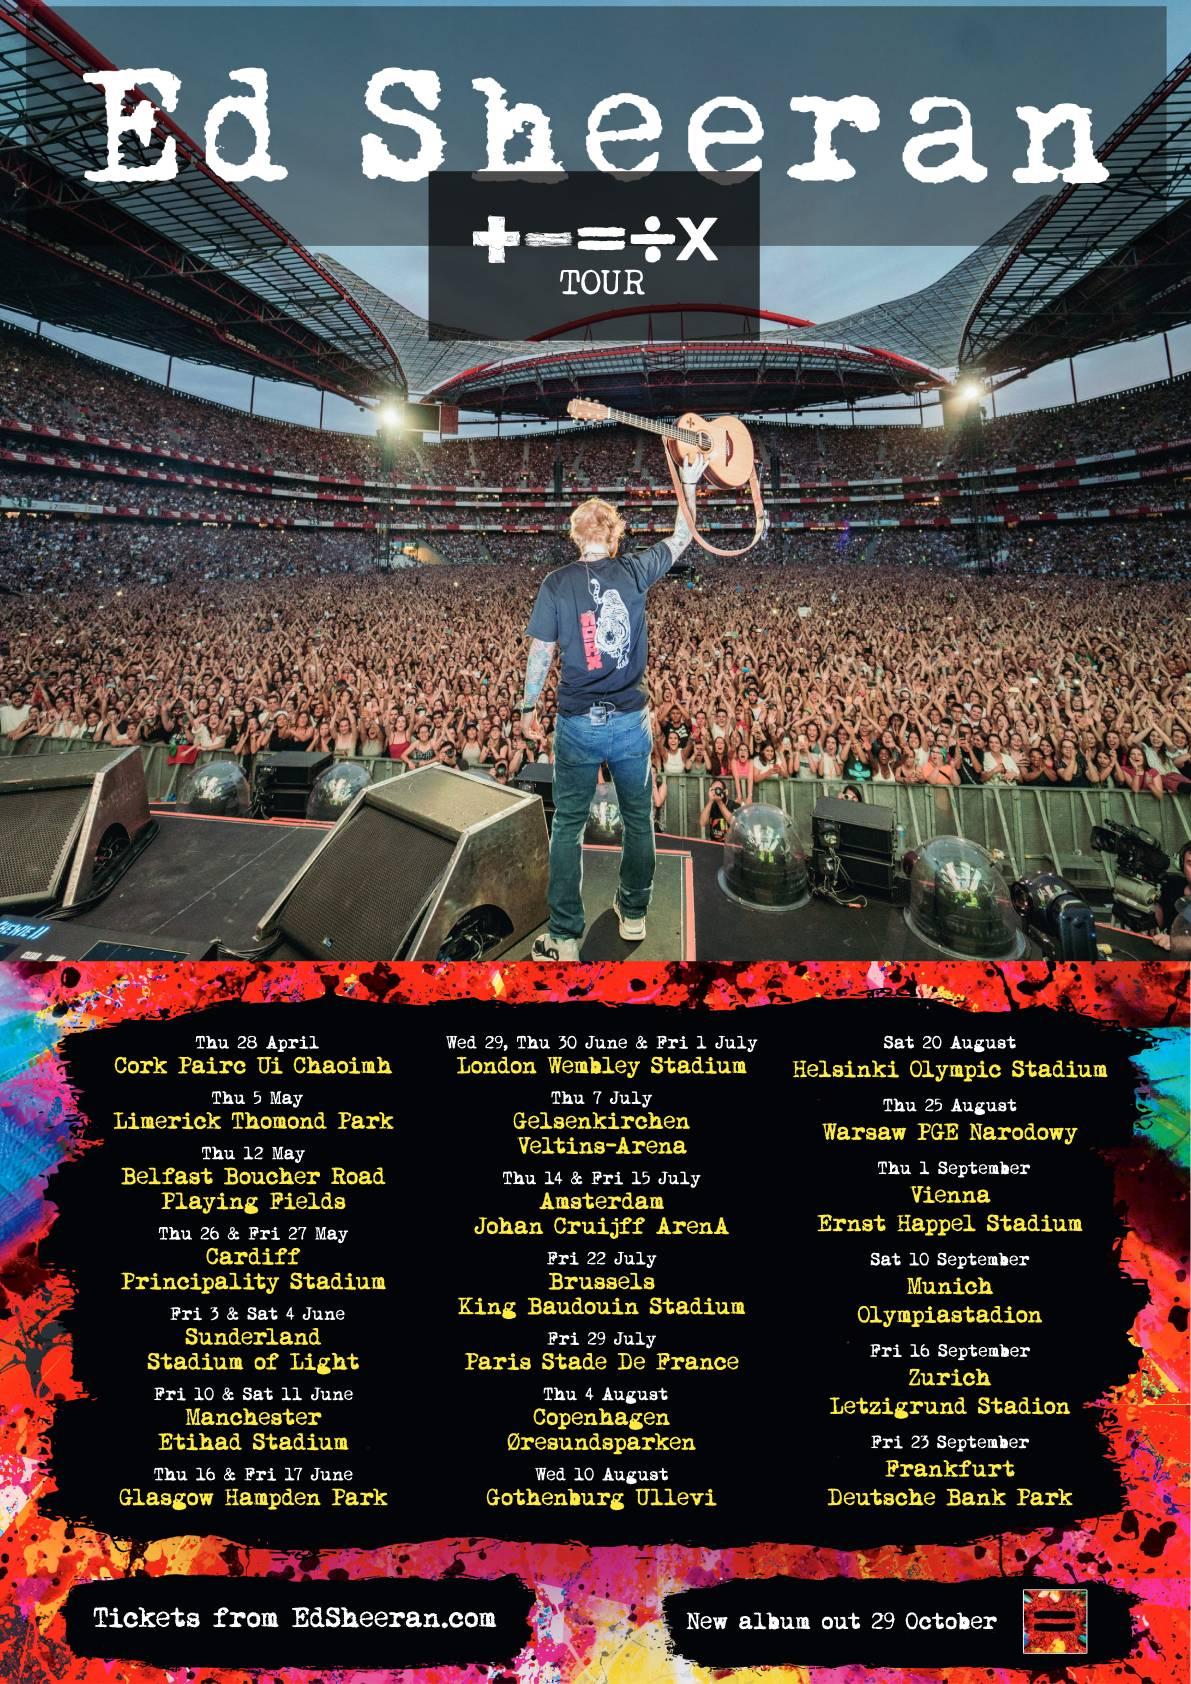 Ed Sheeran's '+ - = ÷ x Tour'